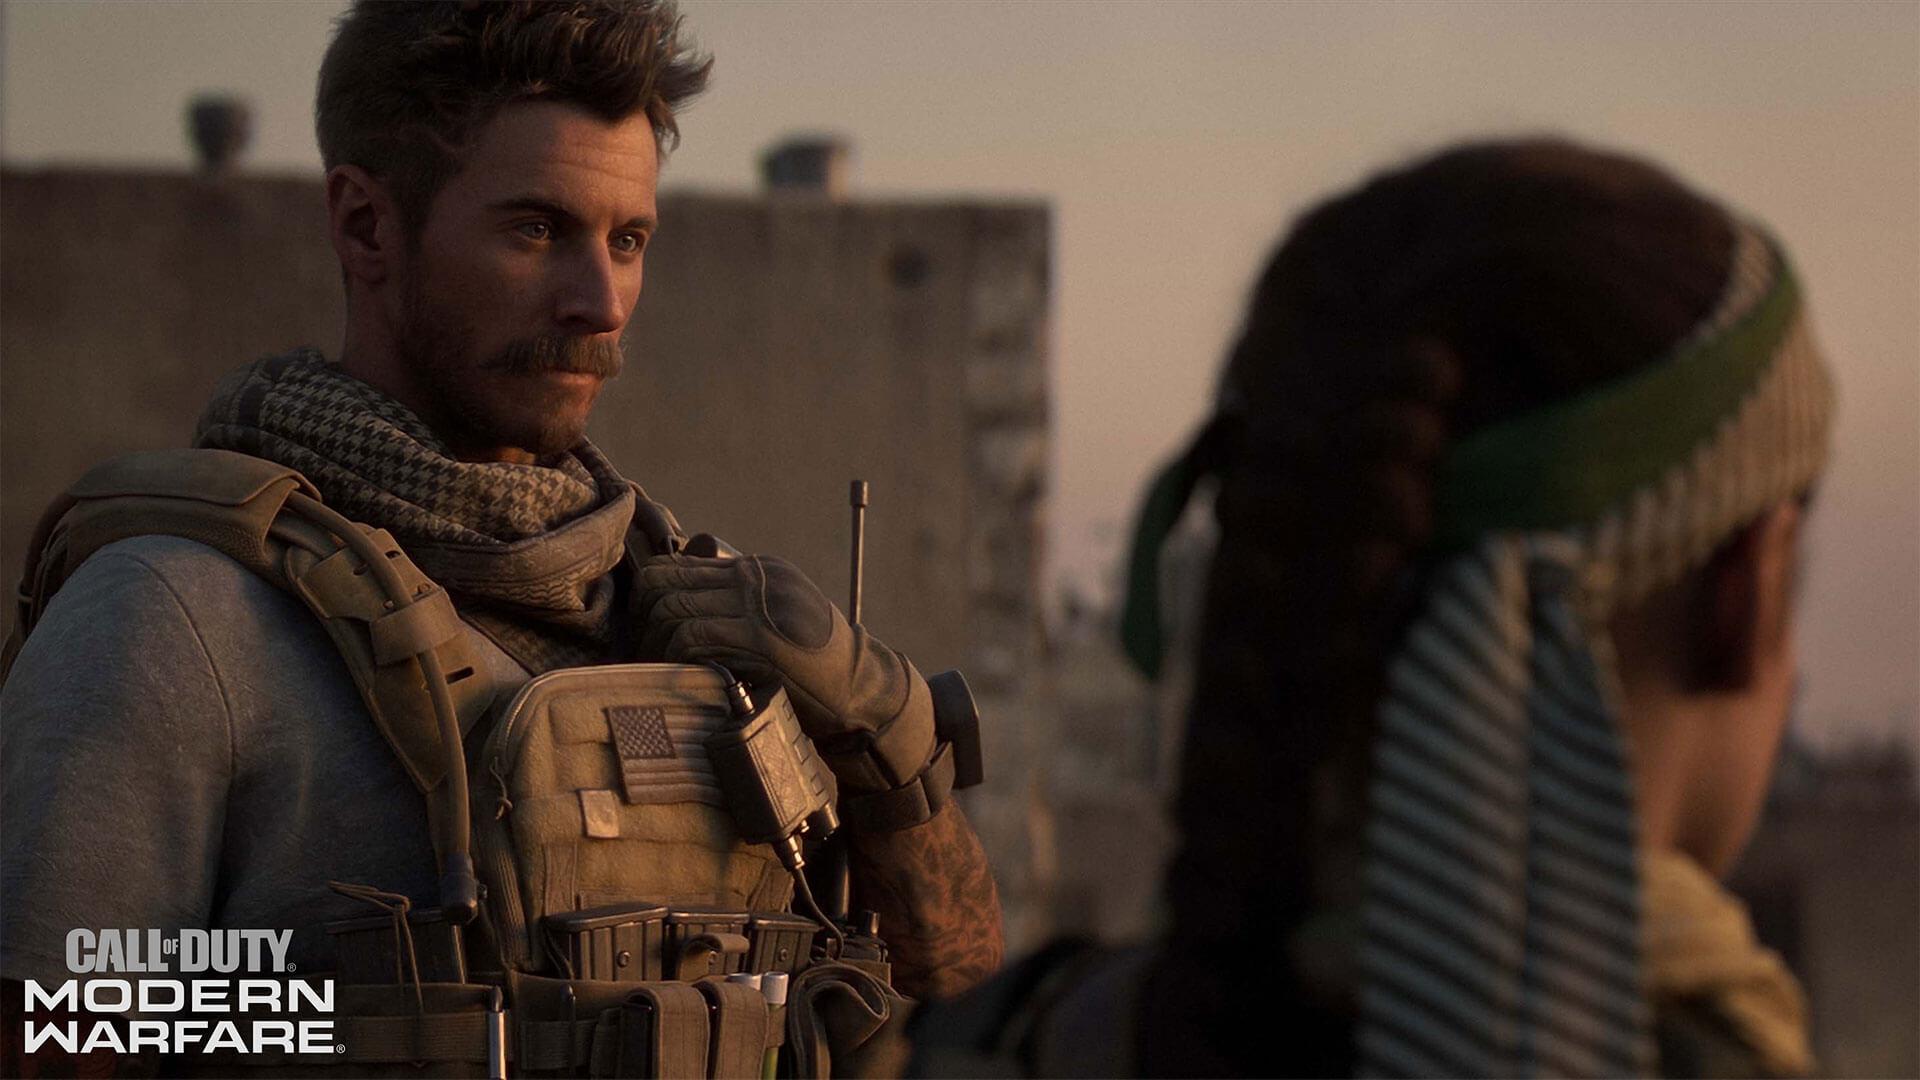 Call of Duty Modern Warfare Infinity Ward Activision multiplayer